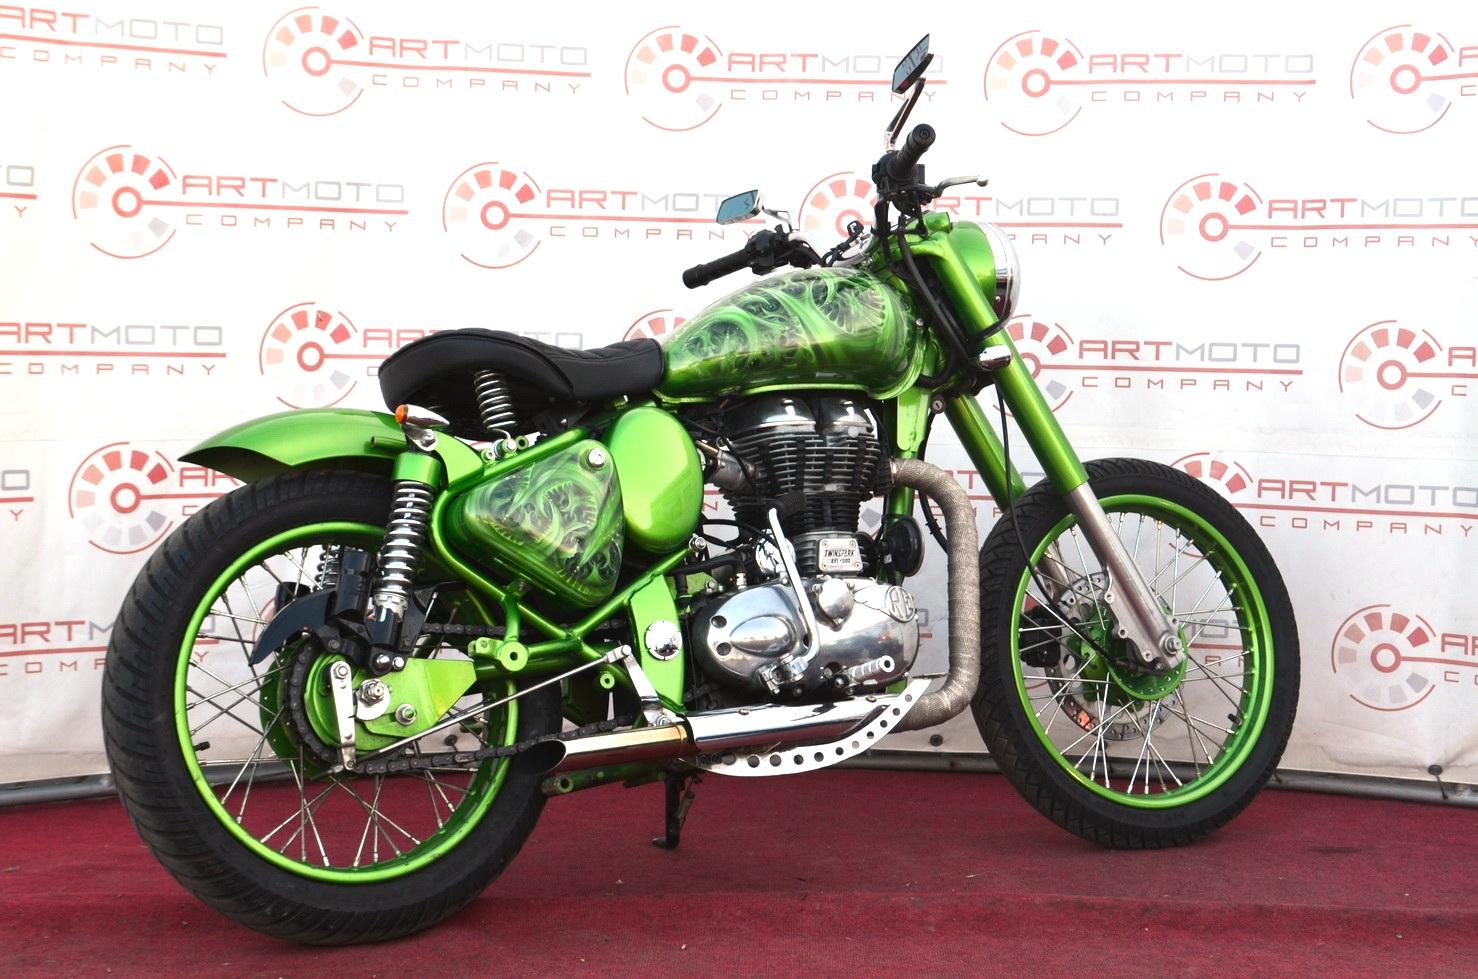 МОТОЦИКЛ ROYAL ENFIELD CLASSIC 500 CUSTOM ― Артмото - купить квадроцикл в украине и харькове, мотоцикл, снегоход, скутер, мопед, электромобиль